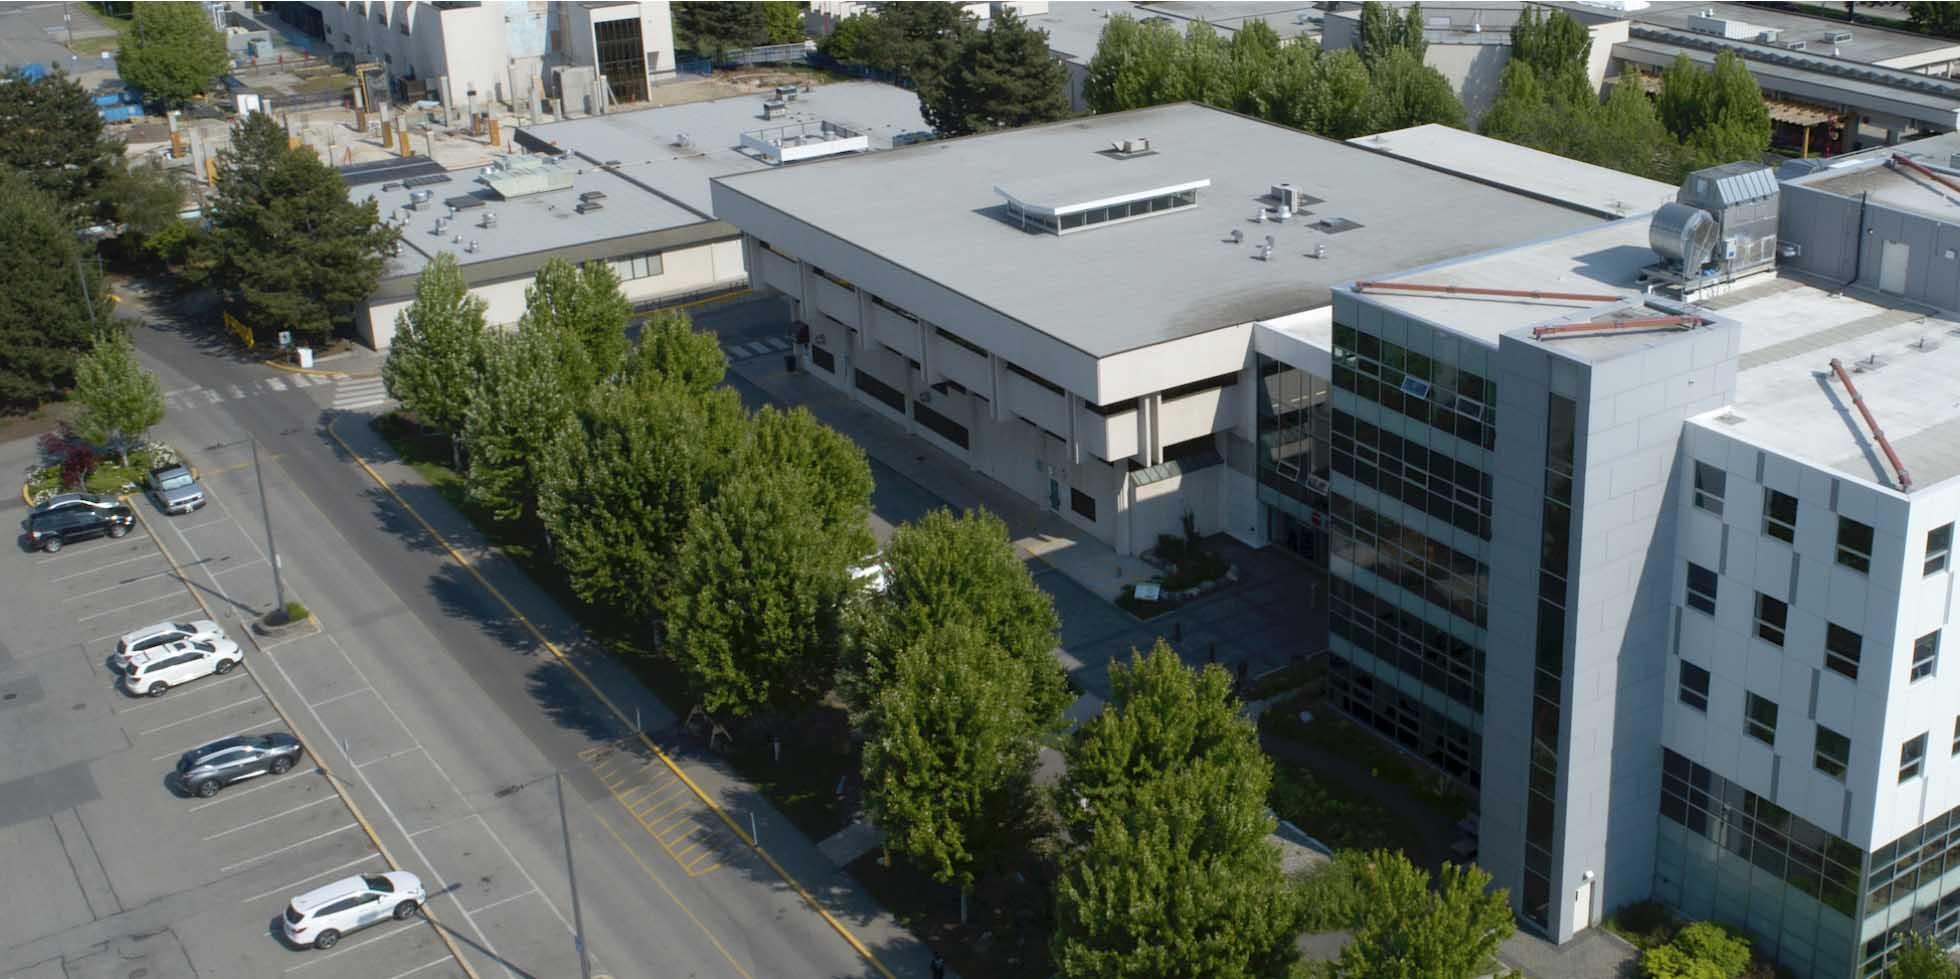 Aerial photo of Okanagan college in Kelowna